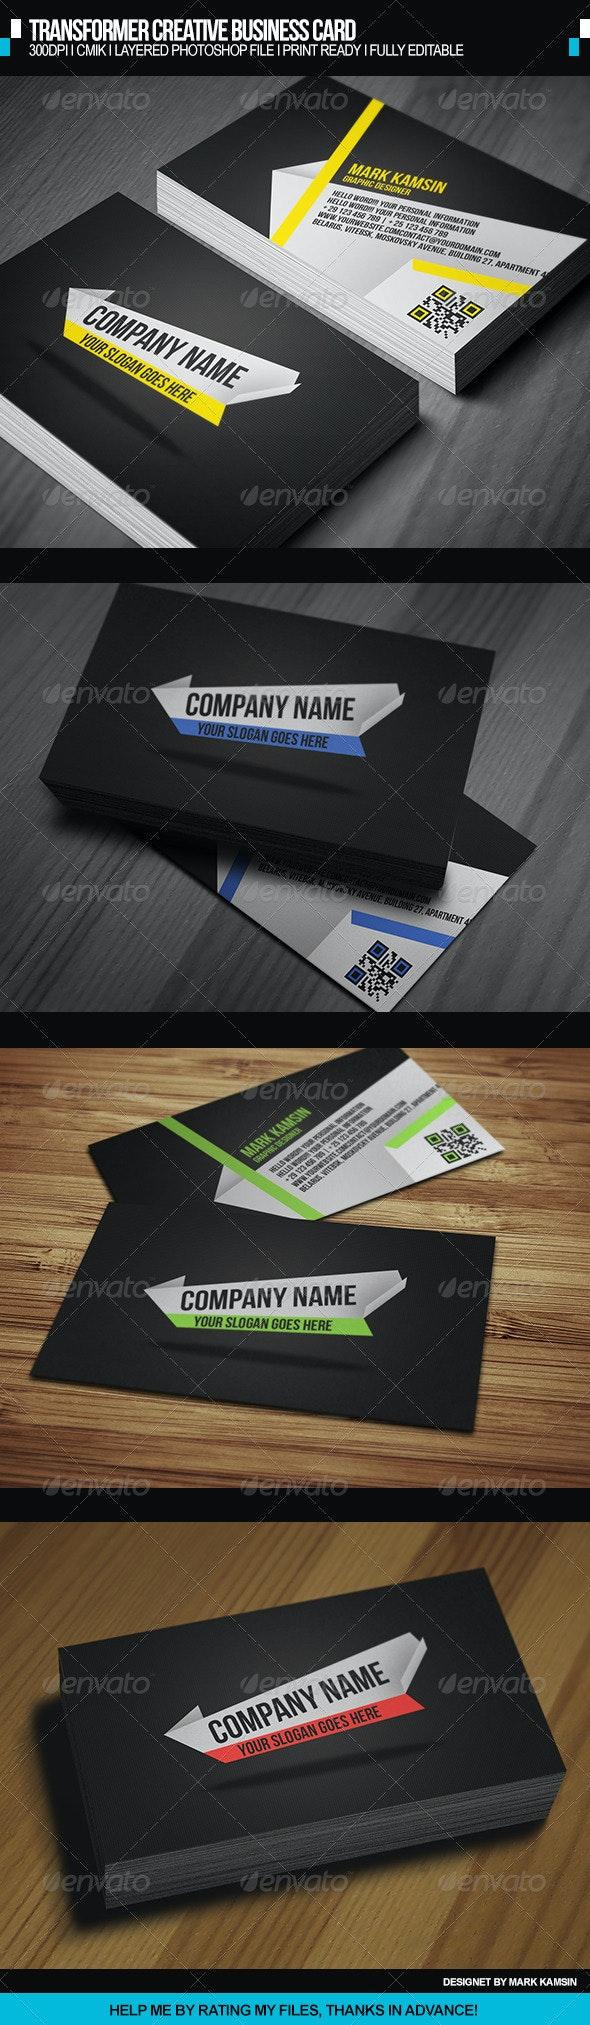 Transformer Creative Business Card - Creative Business Cards